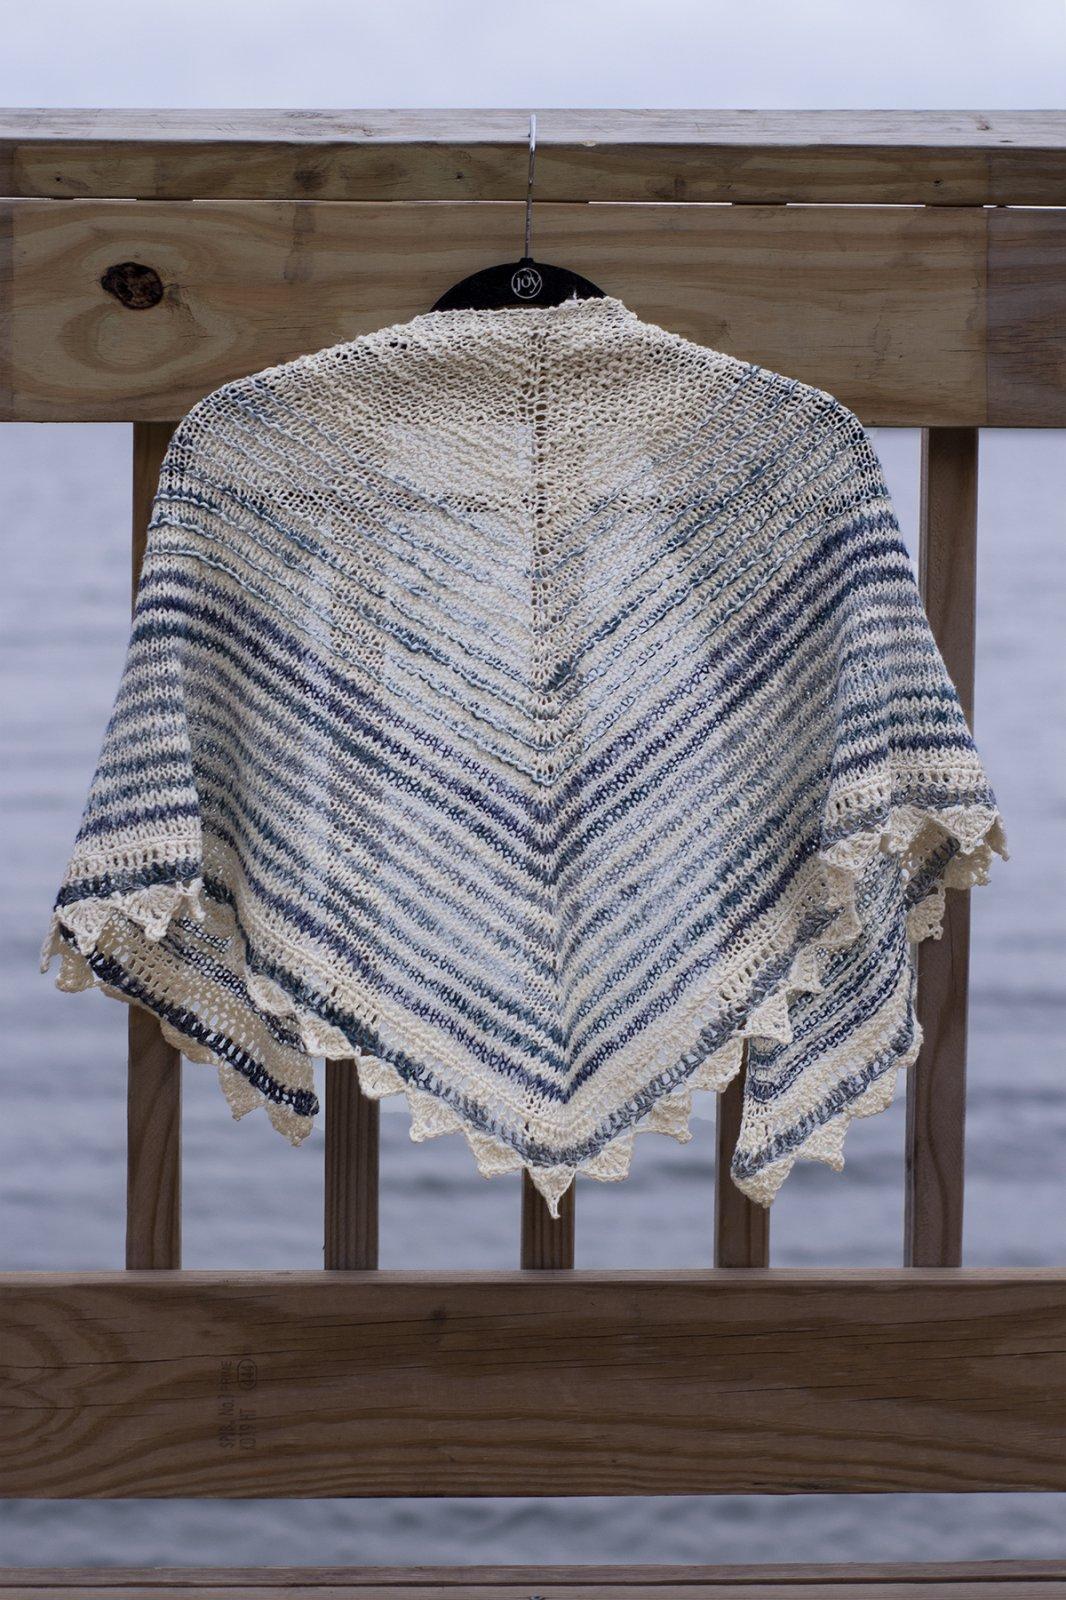 Saltwater Shawl Kit from Universal Yarns